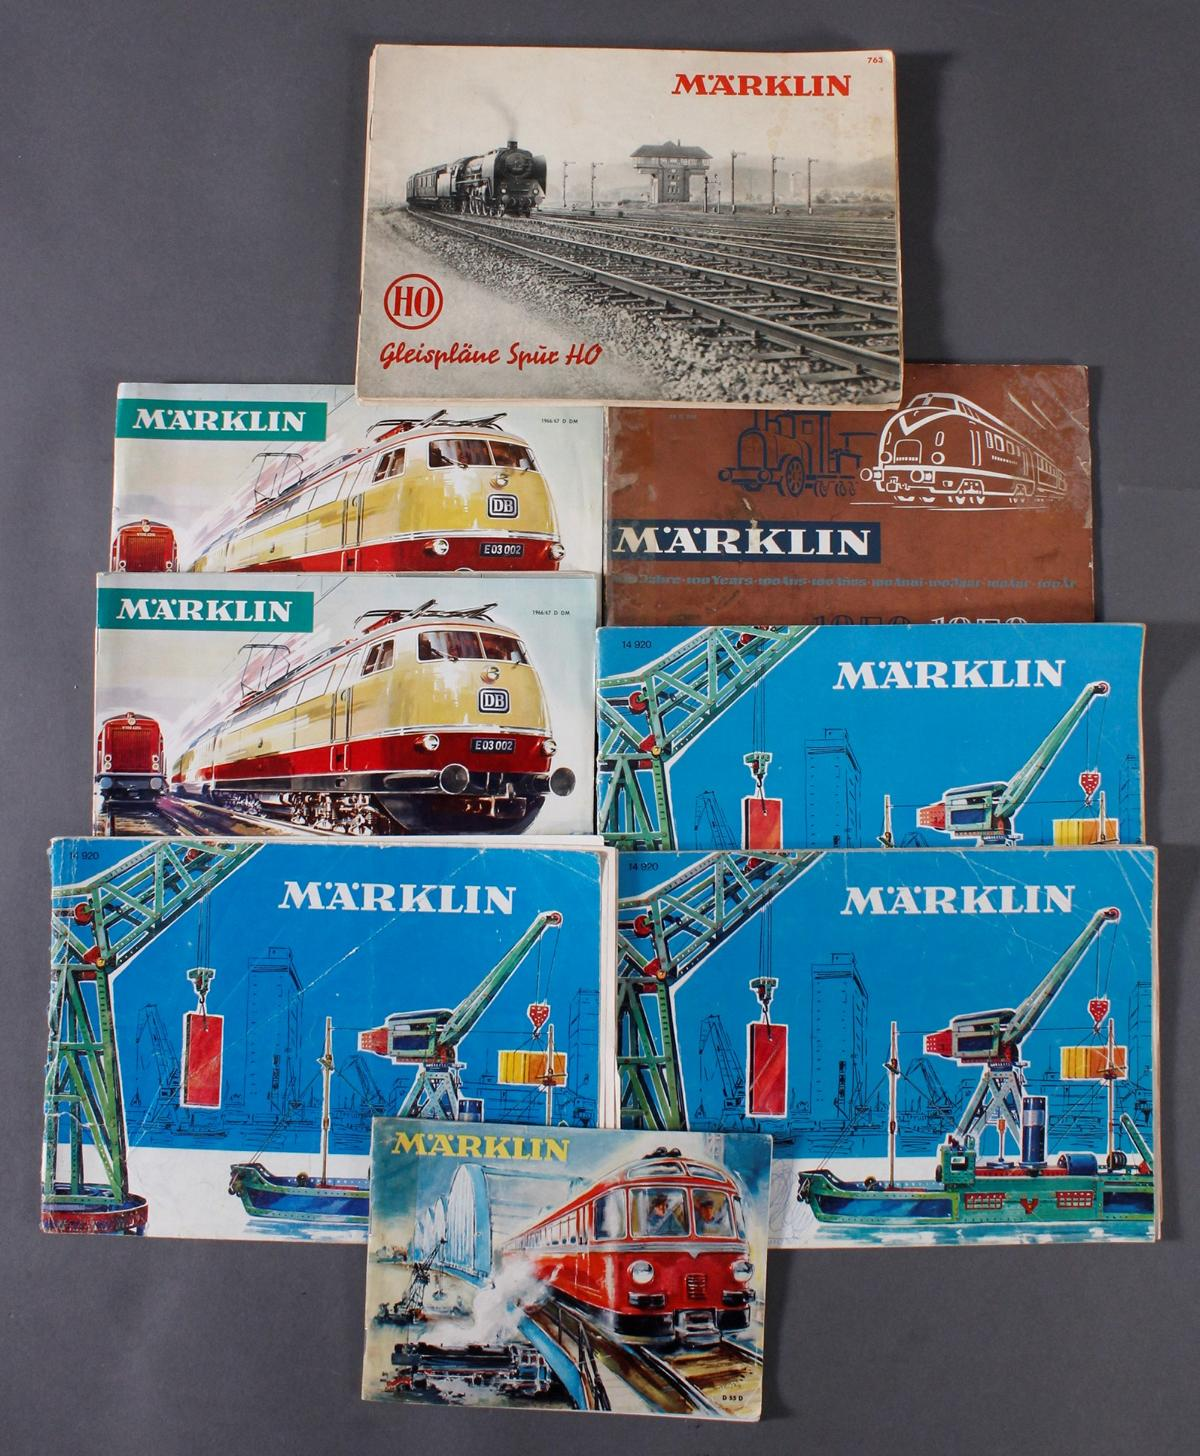 Konvolut Märklin Eisenbahn- und Modellbaukästenkataloge